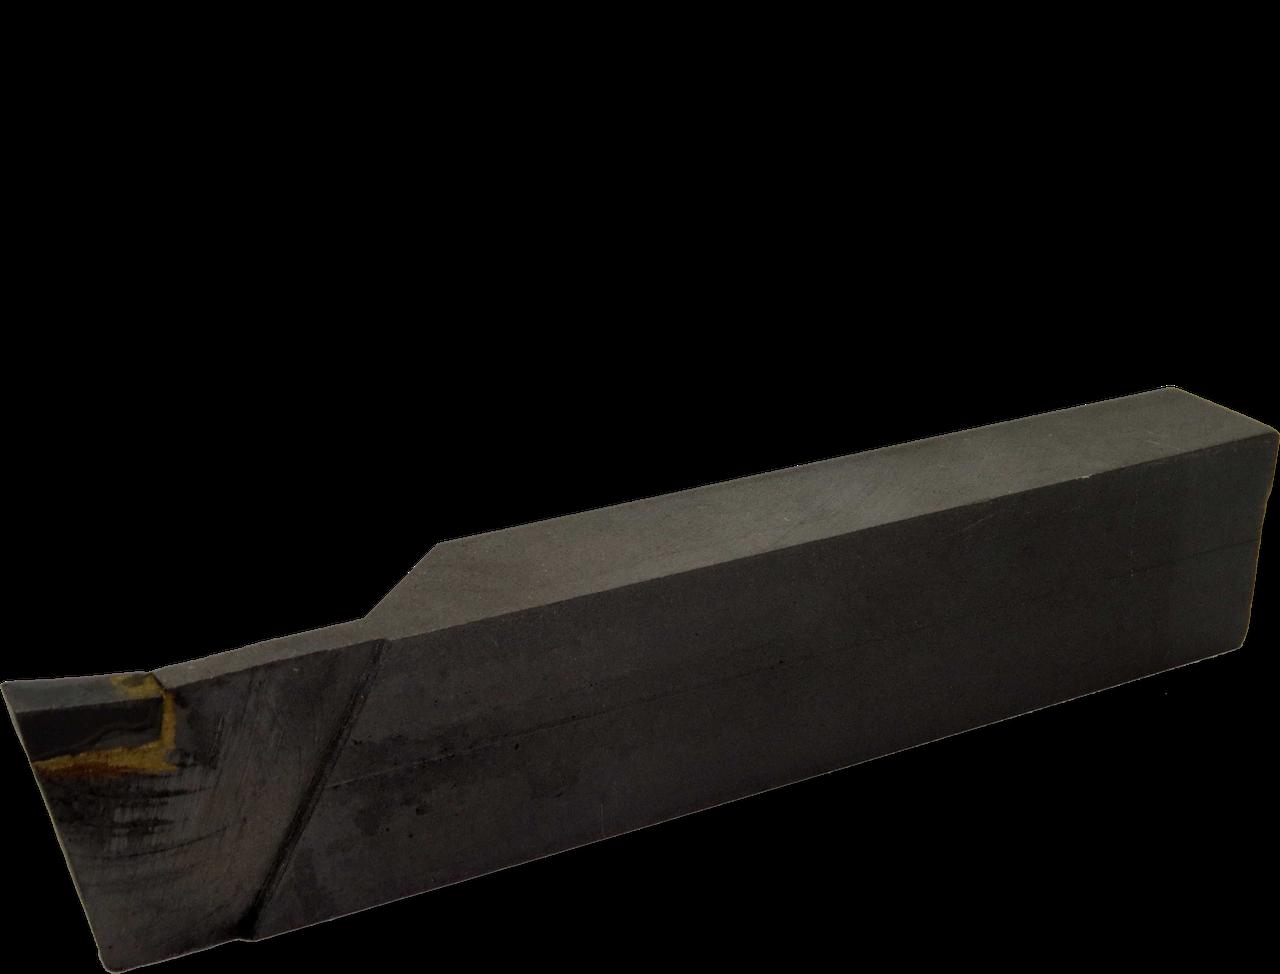 Резец токарный отрезной 25х16х140 СИТО (ВК8) (Беларусь)